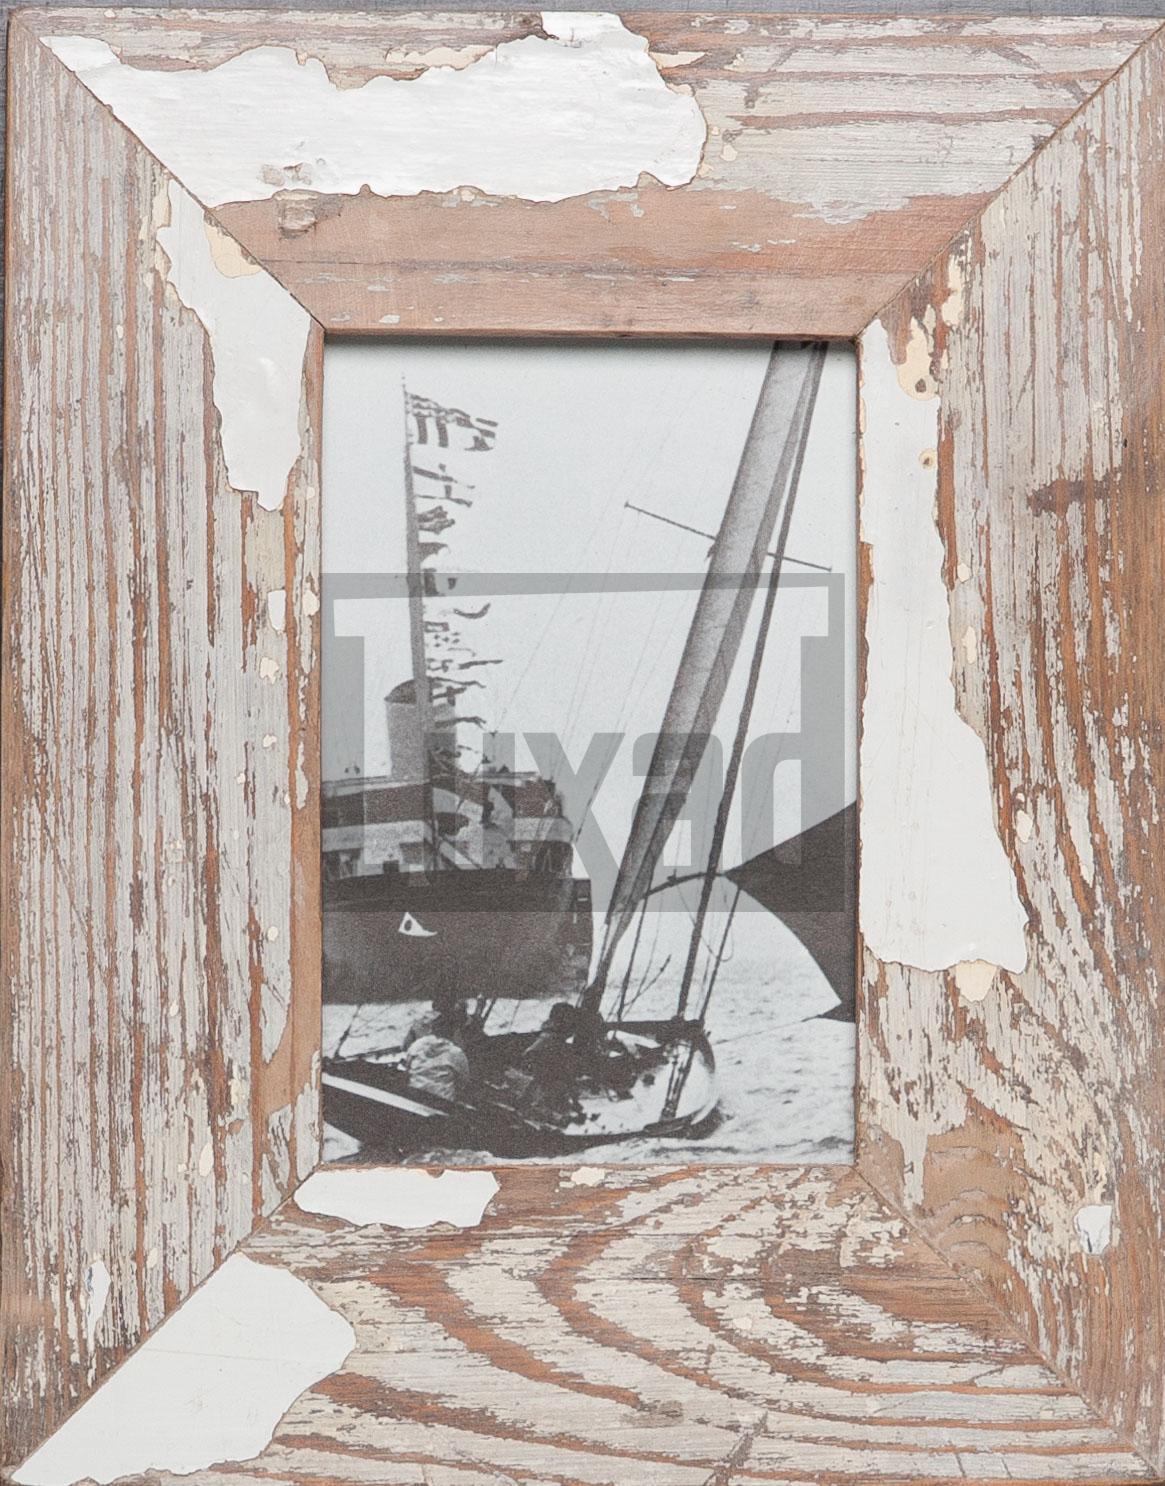 Vintage-Fotorahmen aus recyceltem Holz für 10 x 15 cm große Fotos